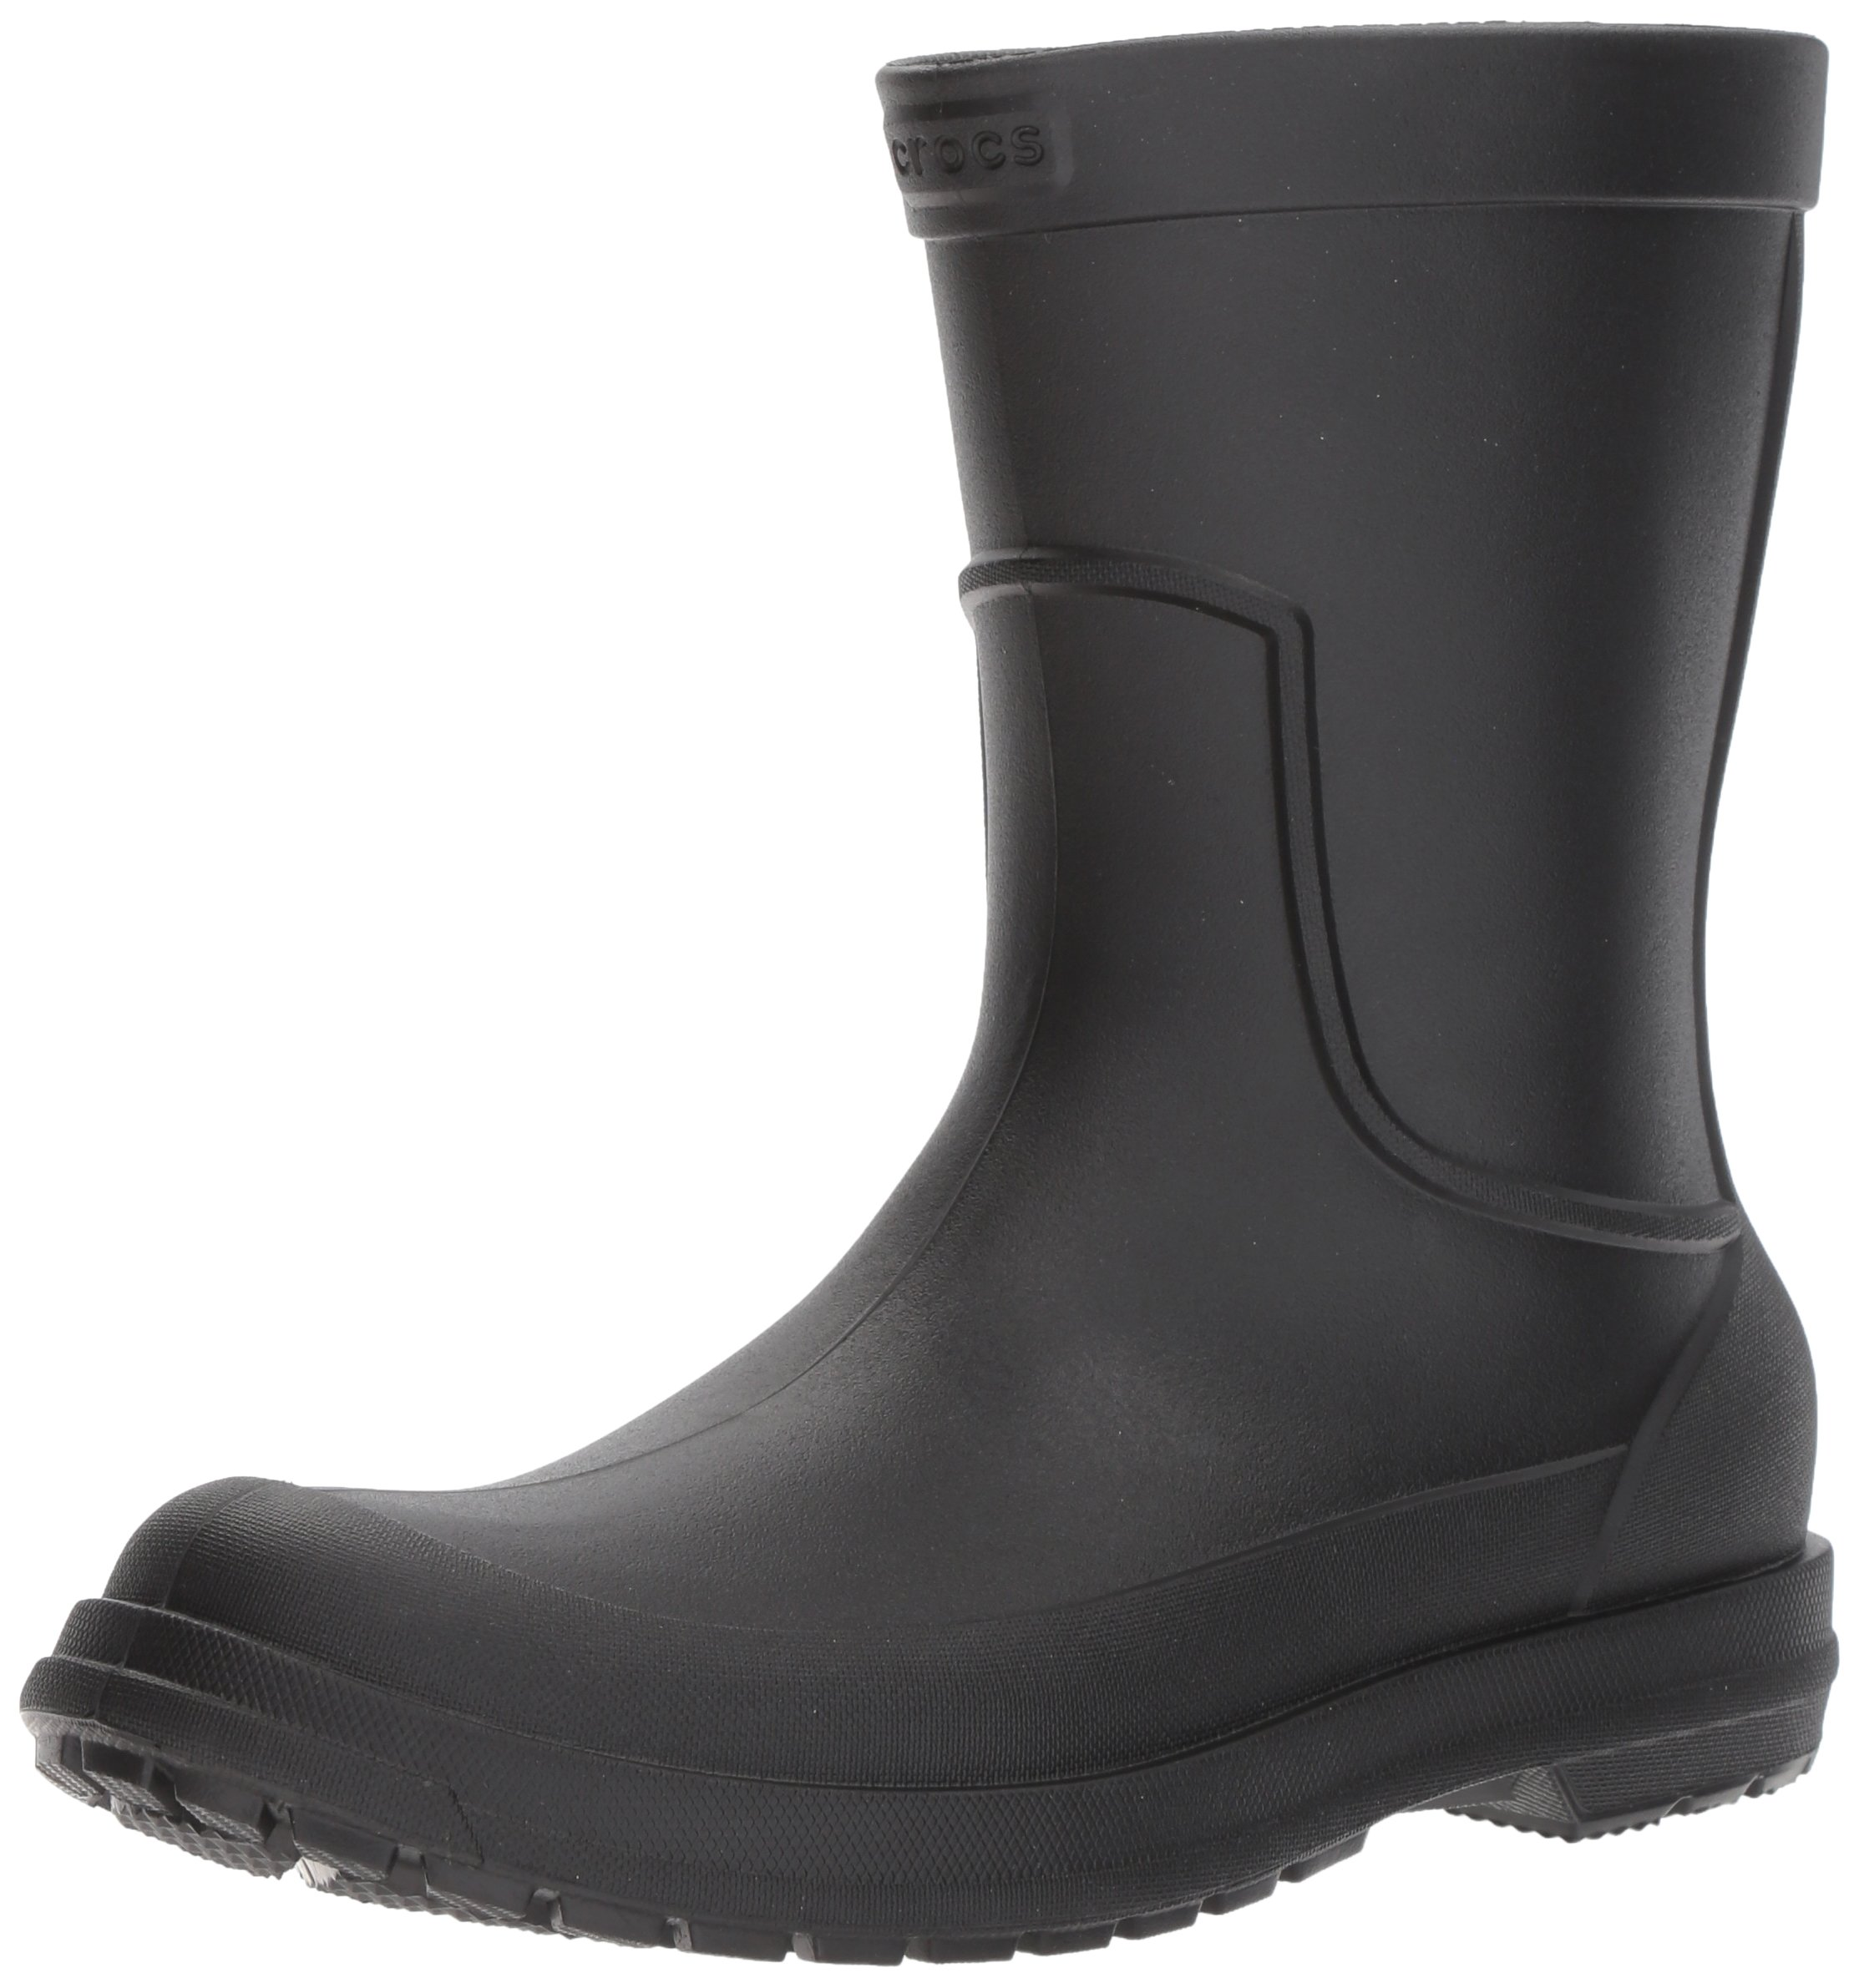 Crocs Men's AllCast M Rain Boot, Black/Black, 12 M US